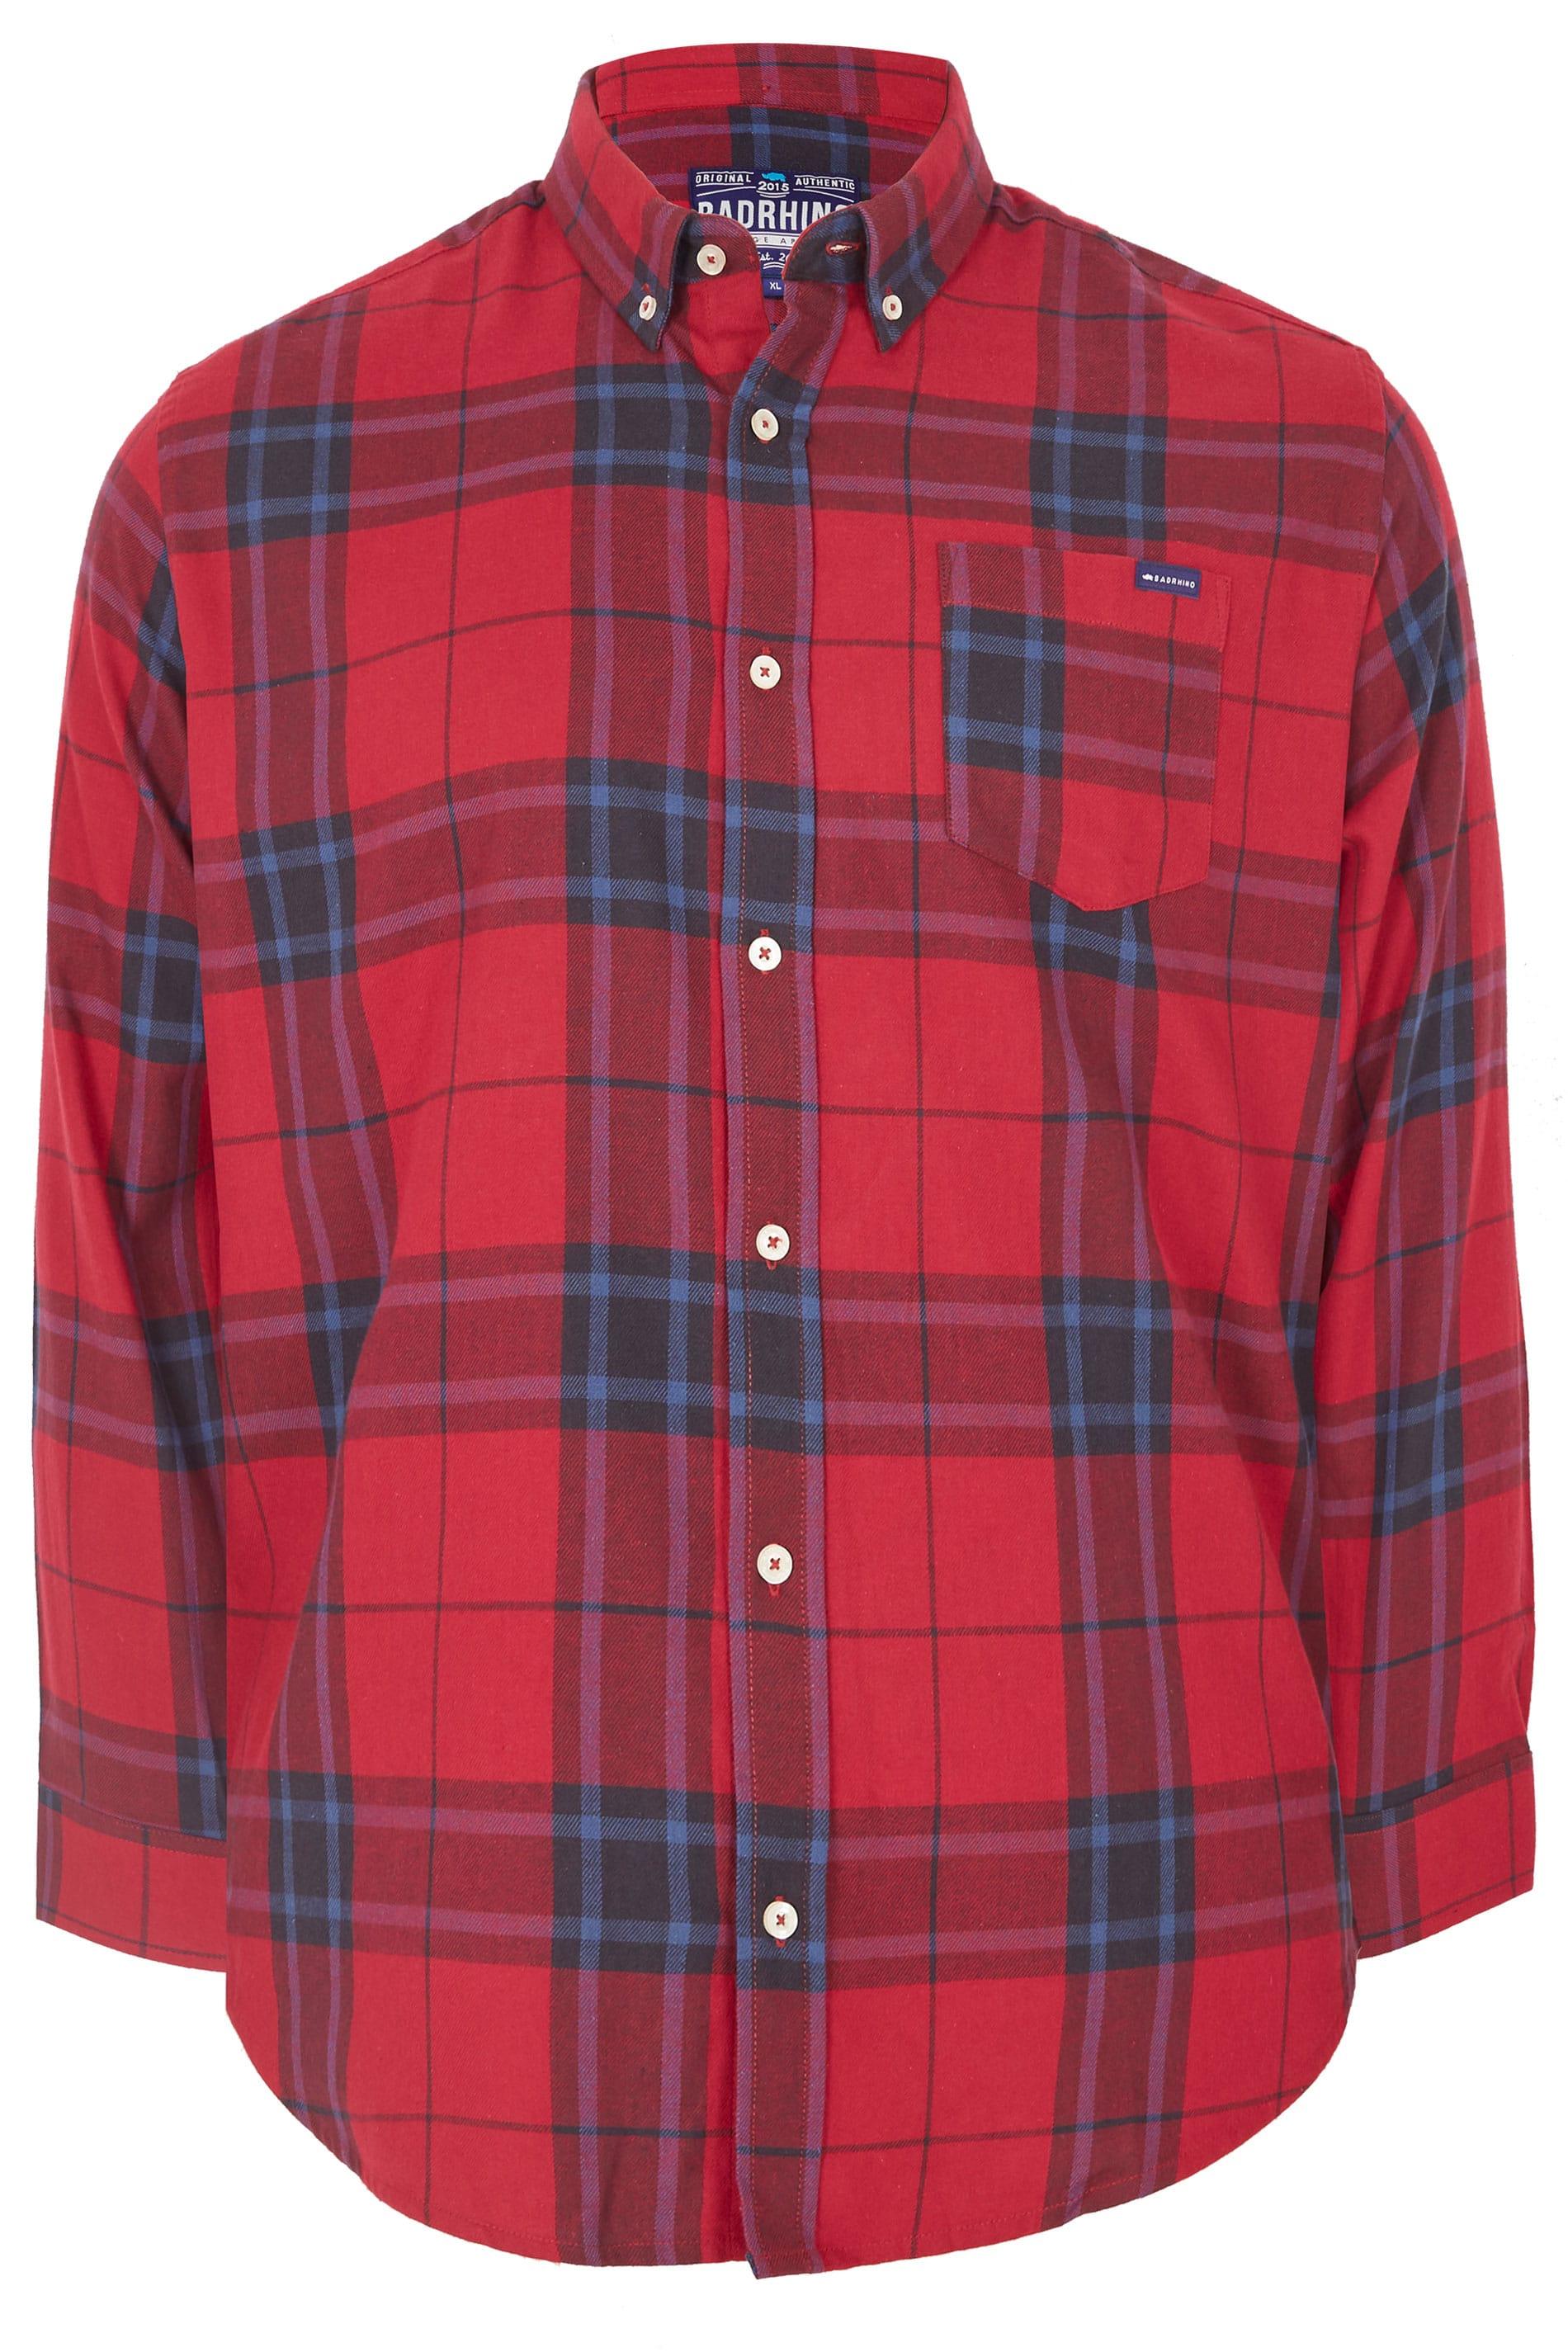 Badrhino Mens Red /& Blue Checked Shirt